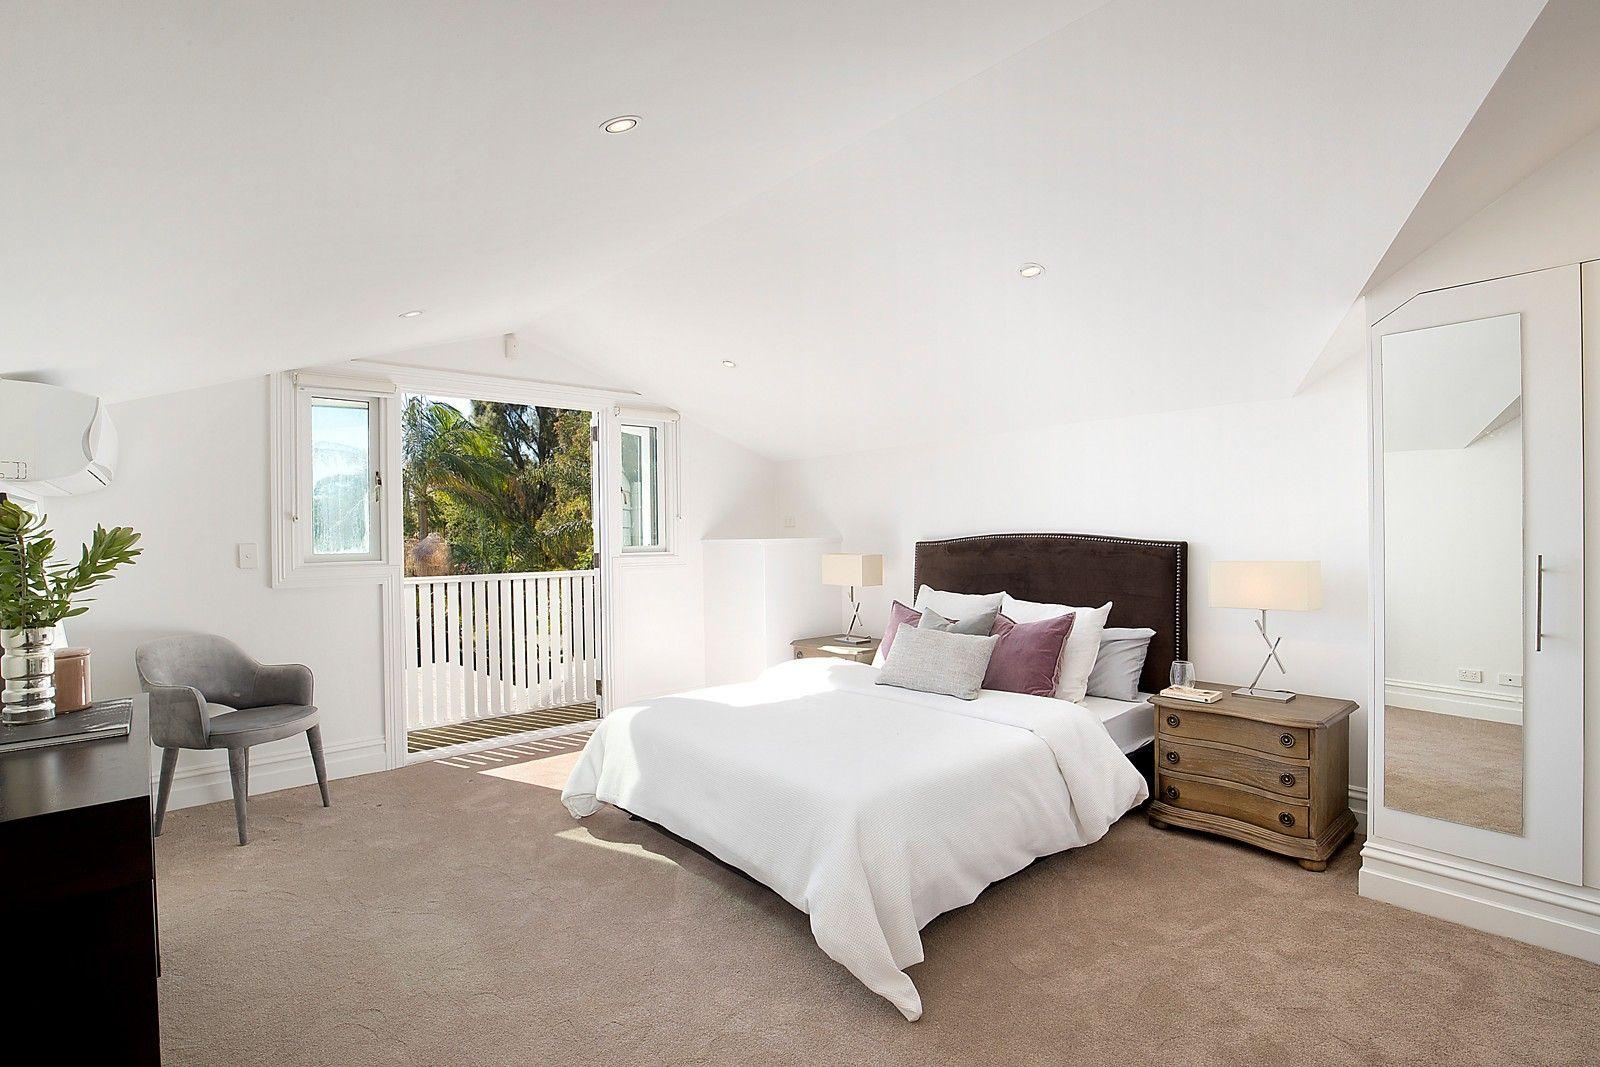 Master bedroom huge  Huge main bedroom w builtins u balcony design modern residence